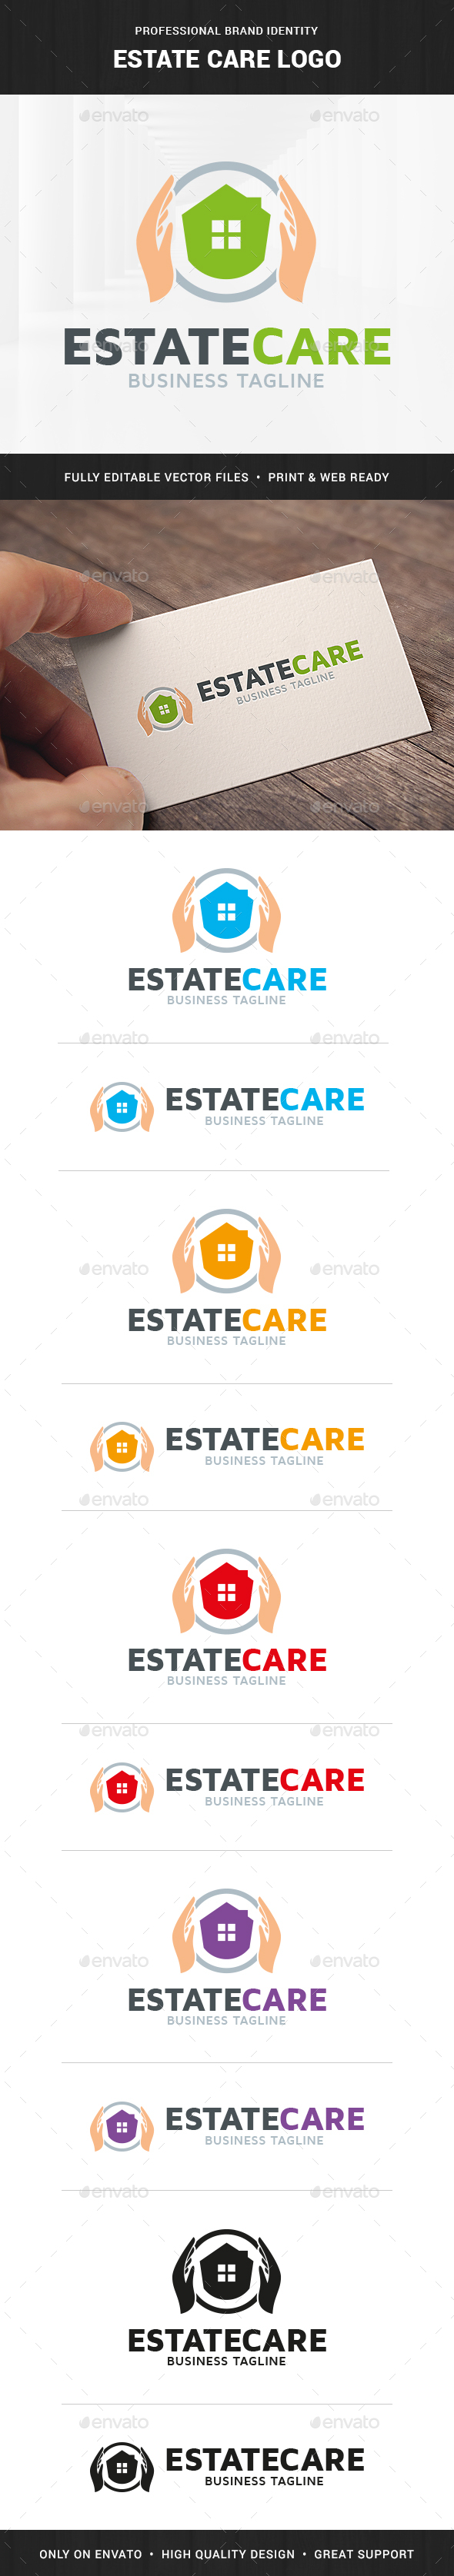 Estate Care Logo Template